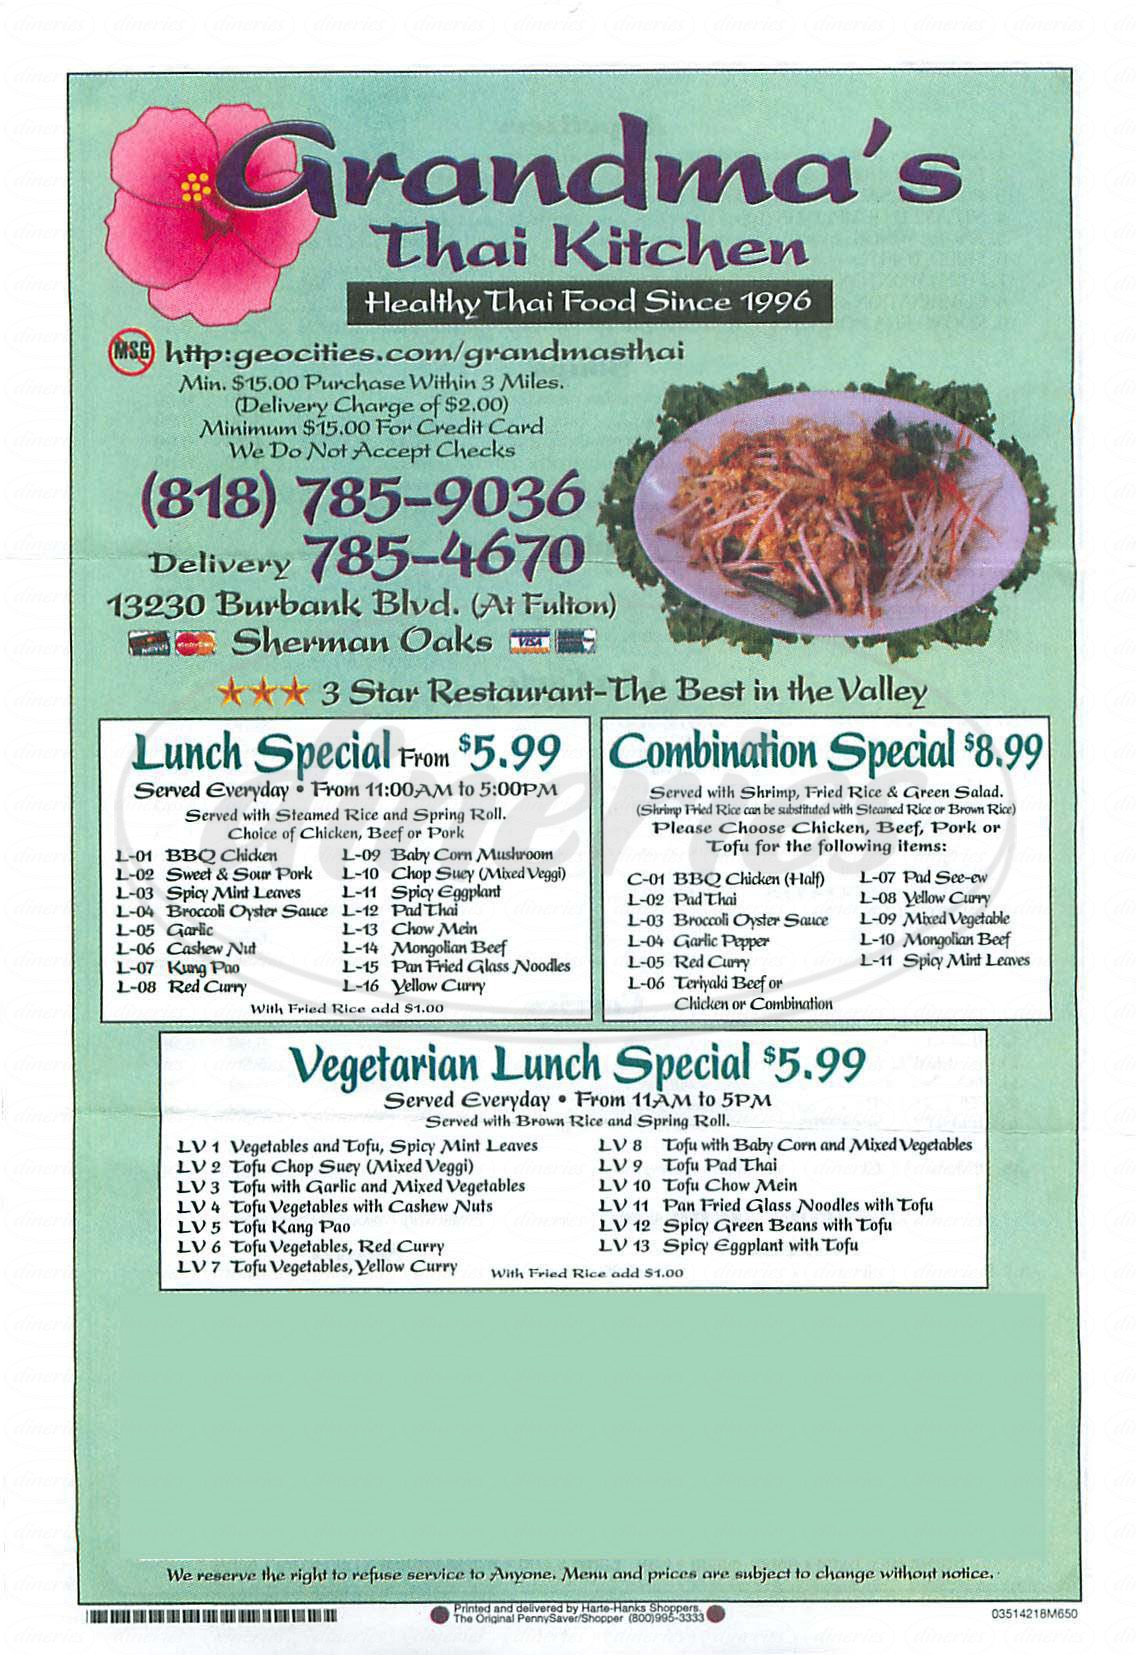 menu for Grandmas Thai Kitchen